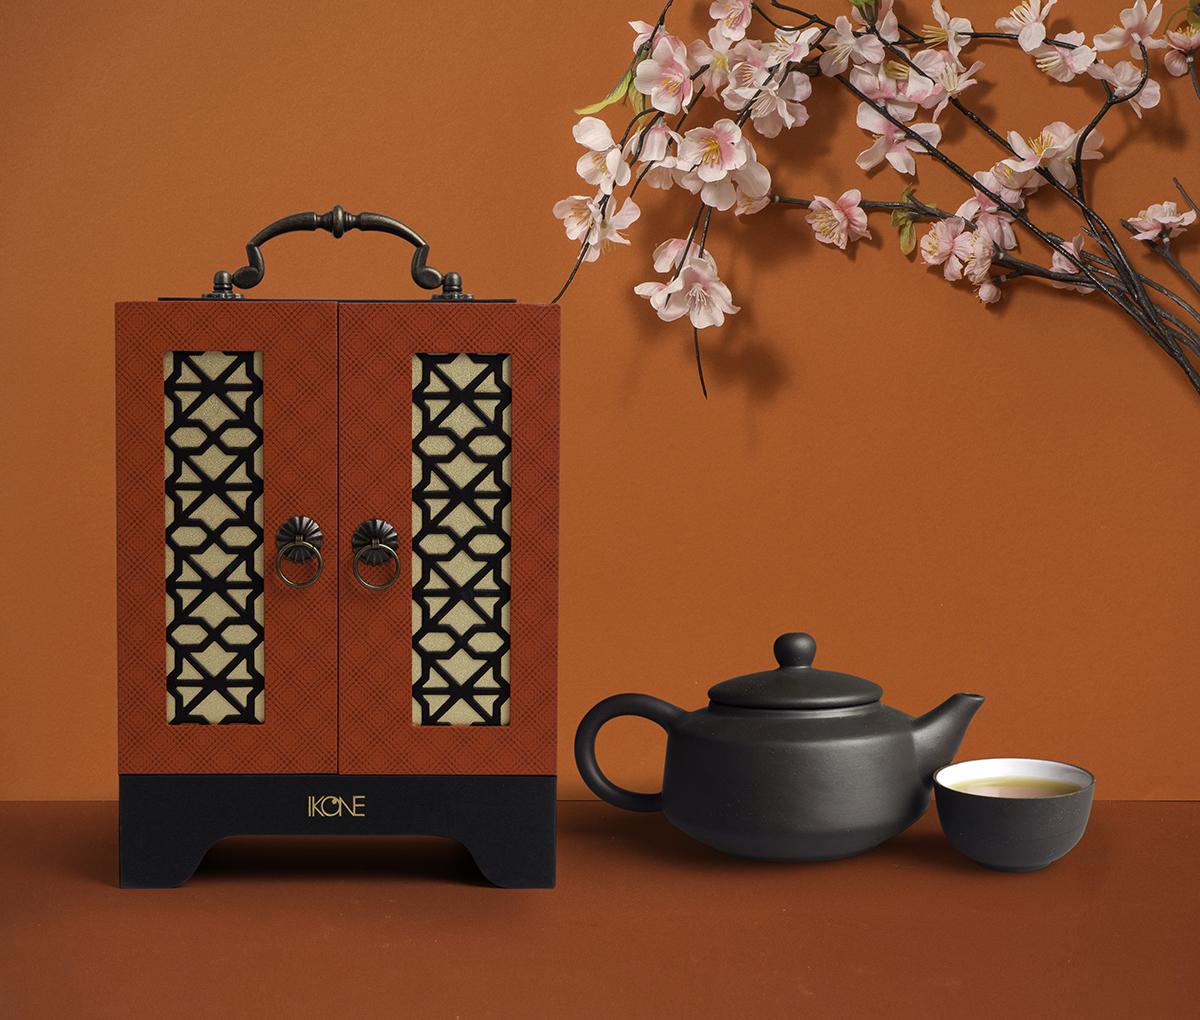 CNY Gifts Box Design